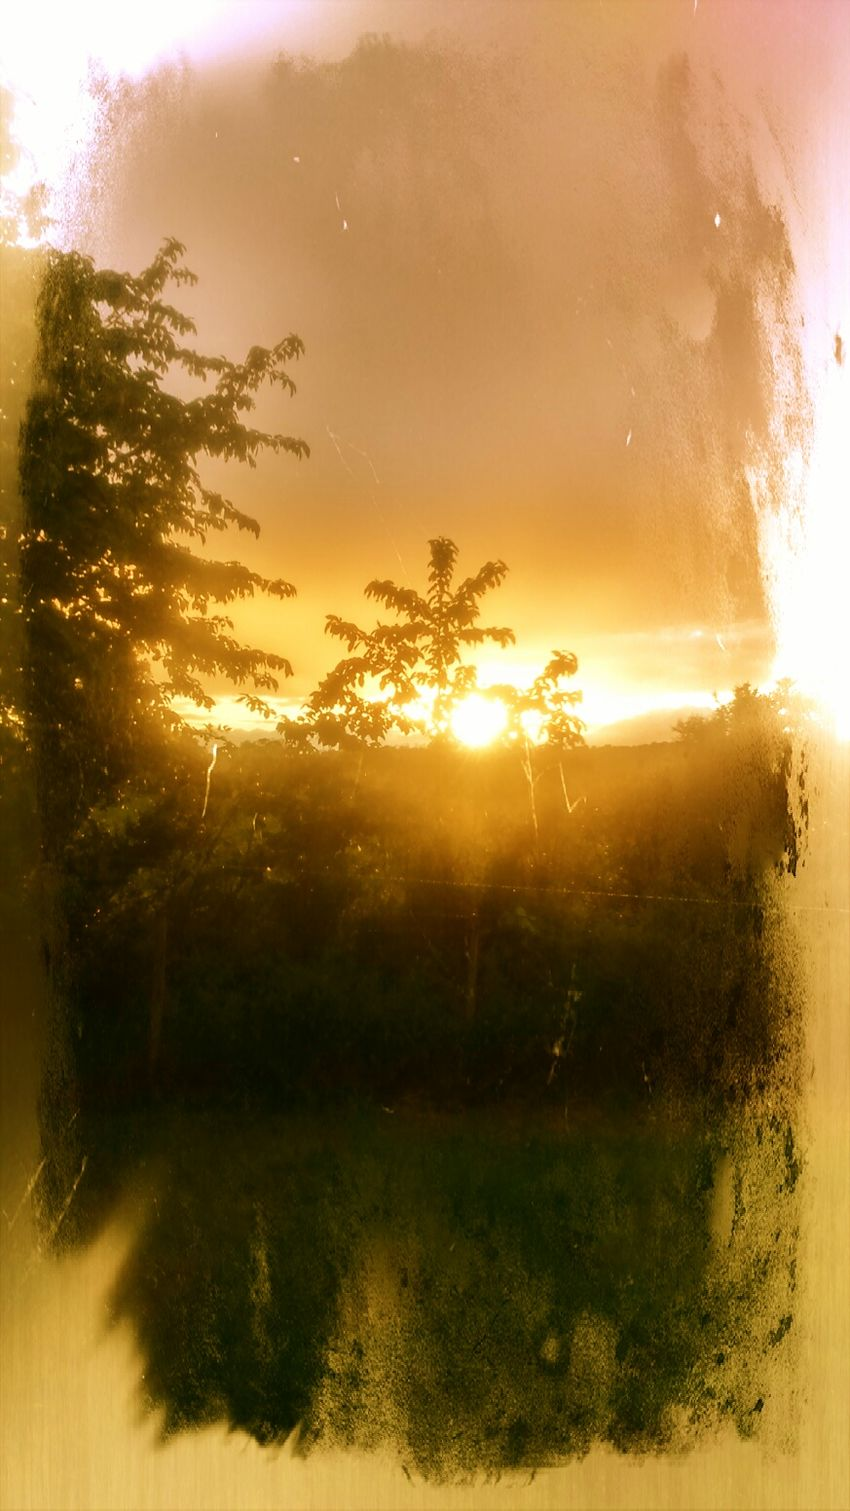 Après la pluie.... Nicedreamslonesomelover Lavieestbelle Enjoying Life Good Vibes✌ Nature Makes Me Smile Justbeforethenight